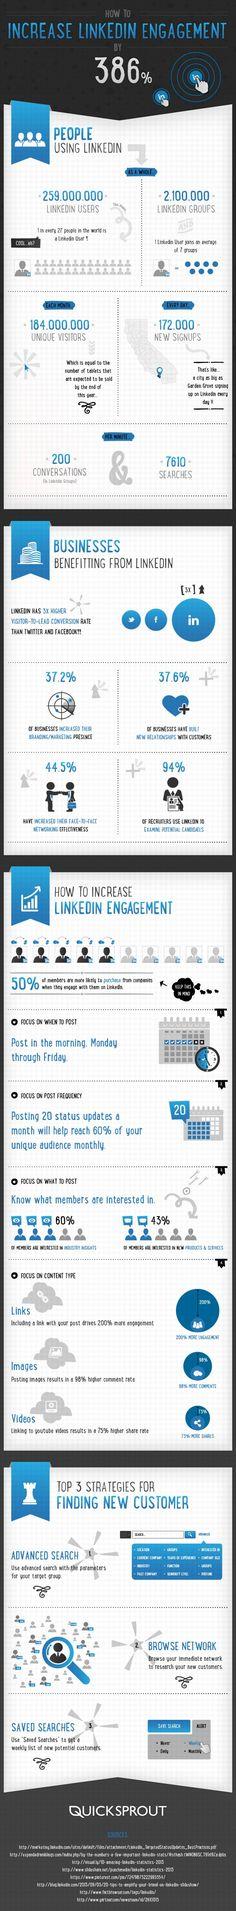 Aumenta el engagement en Linkedin